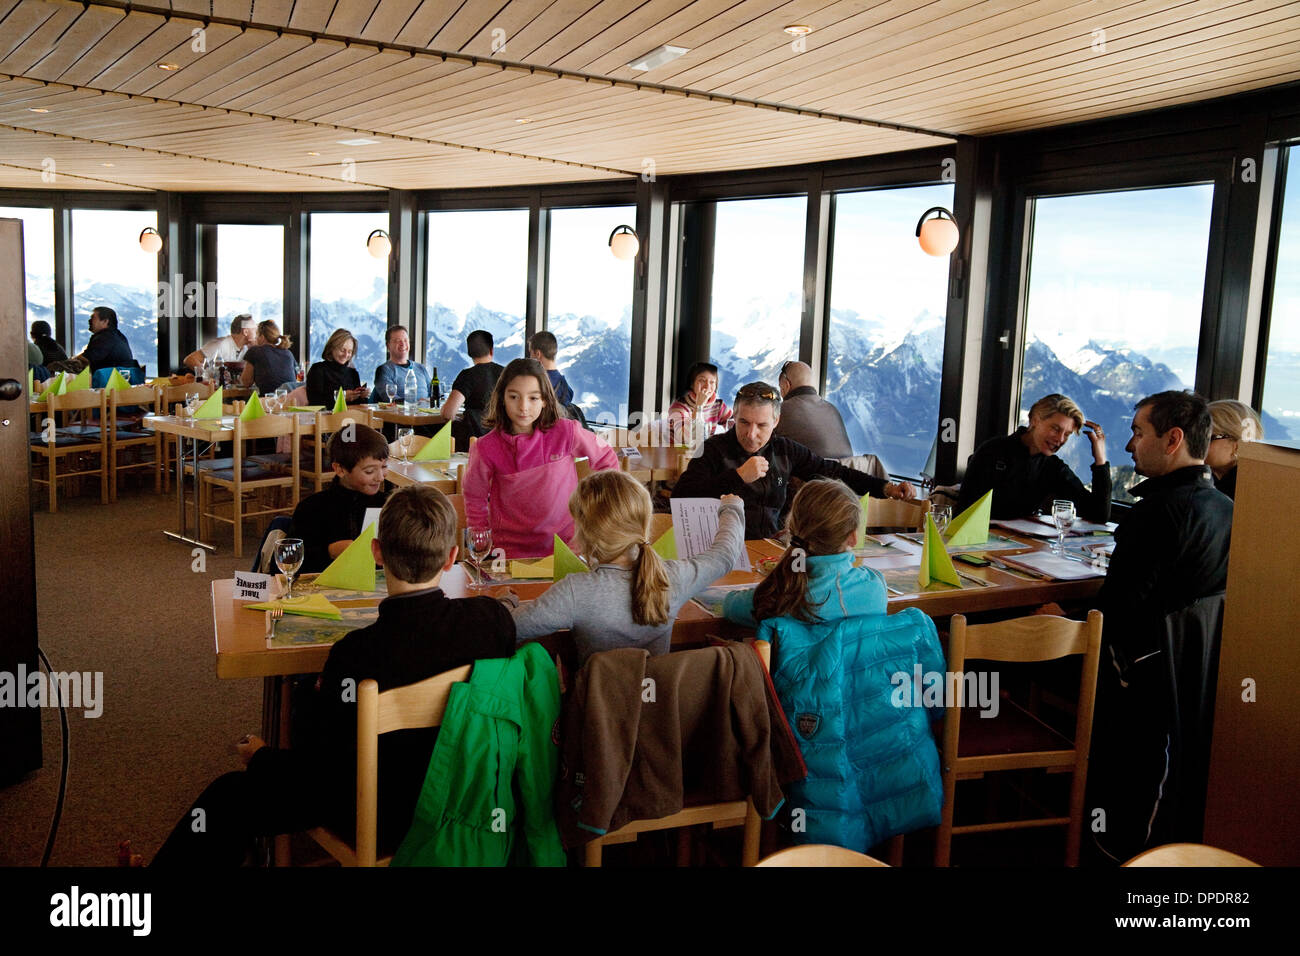 Interior of the Kuklos rotating skiing restaurant at the peak of La Berneuse, Leysin, Vaud, Switzerland Europe - Stock Image